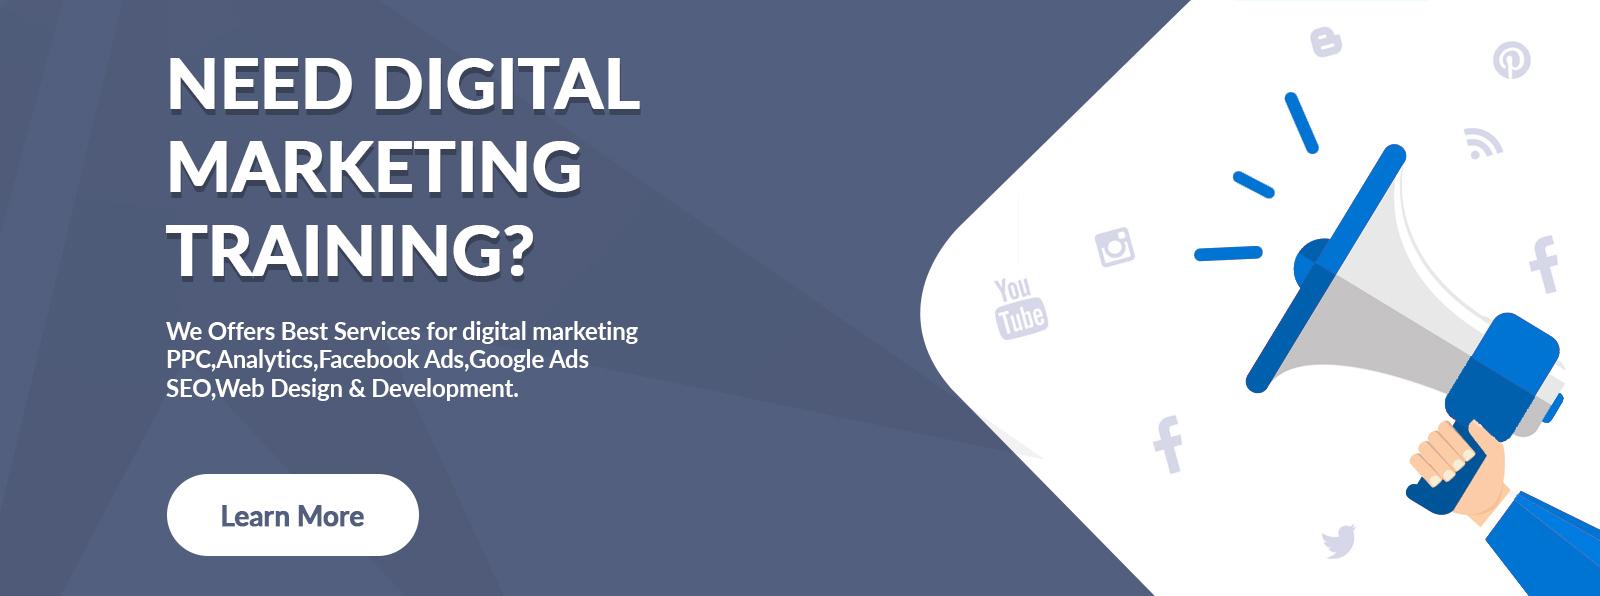 need digital marketing training